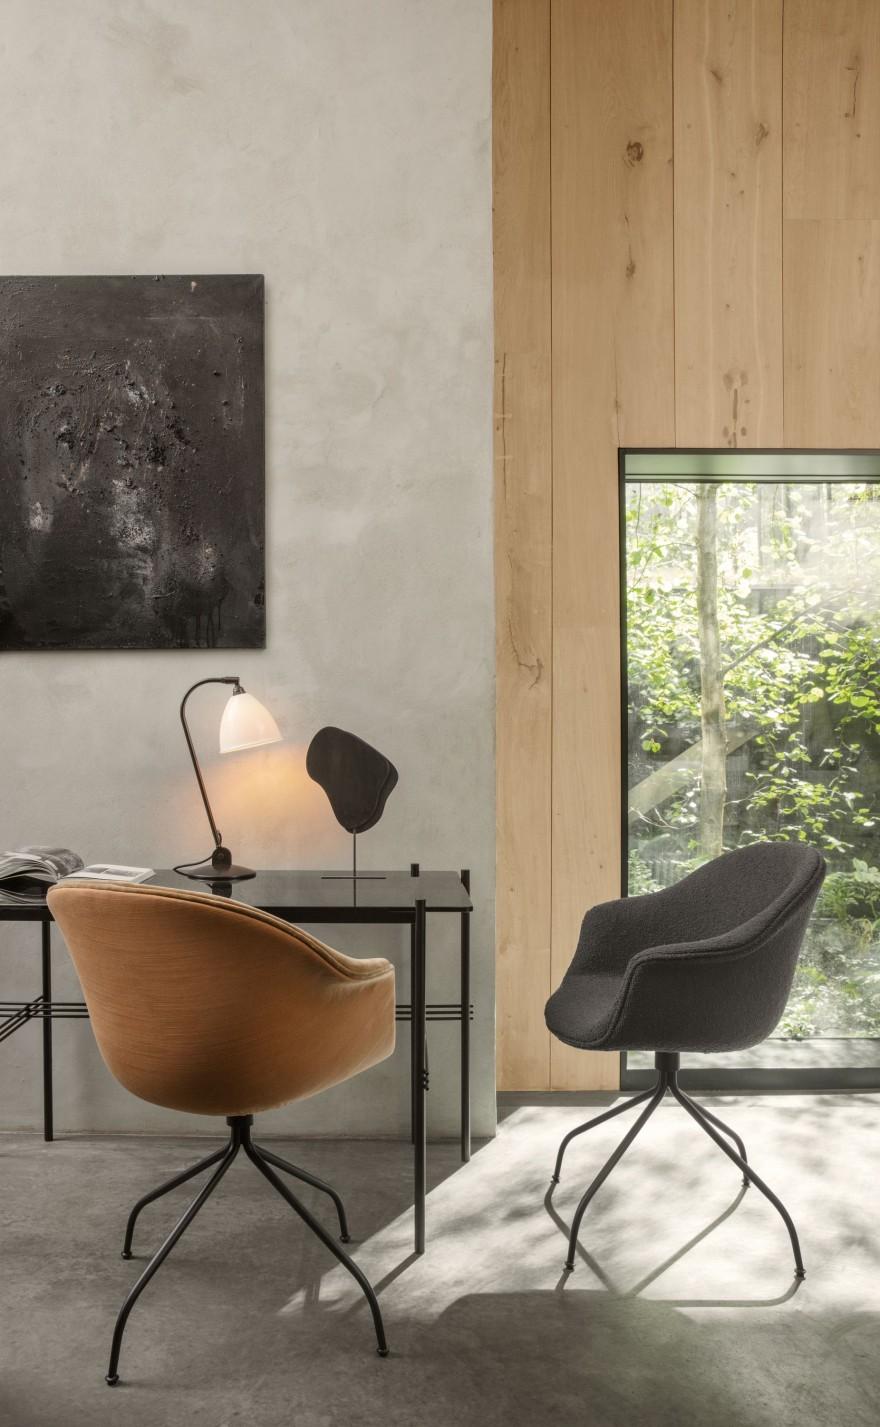 BAT Meeting chairs en TS Table van GamFratesi (GUBI) en Bestlite tafel lamp (1930, design)